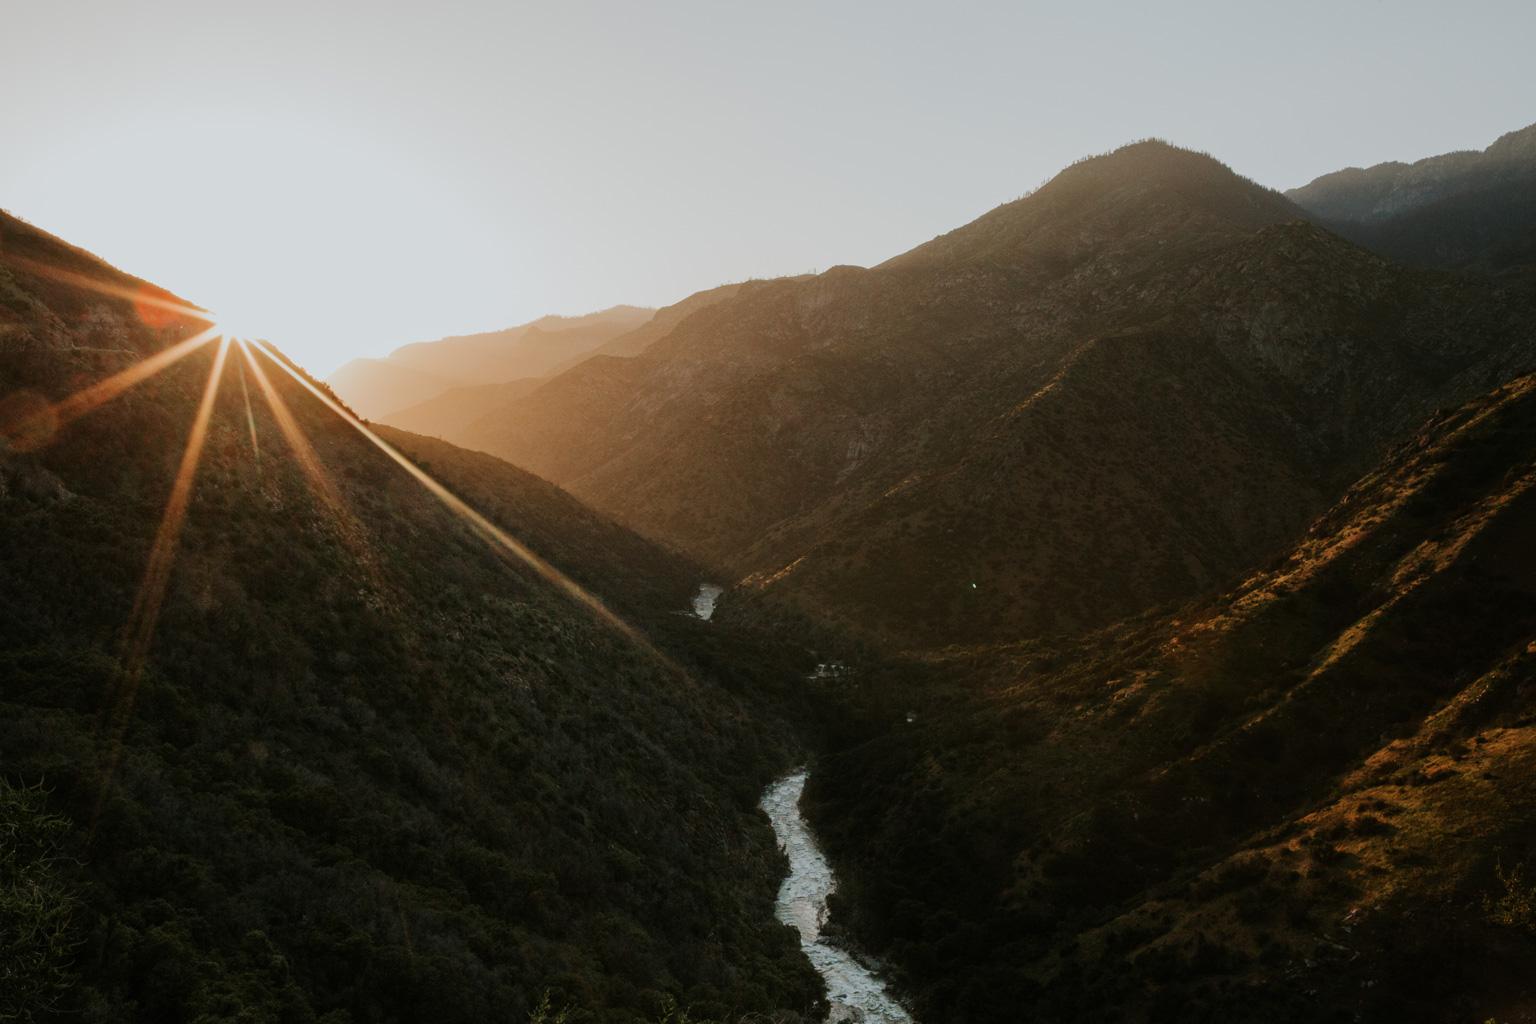 CindyGiovagnoli_Sequoia_KingsCanyon_National_Park_California_roadtrip_travel-009.jpg